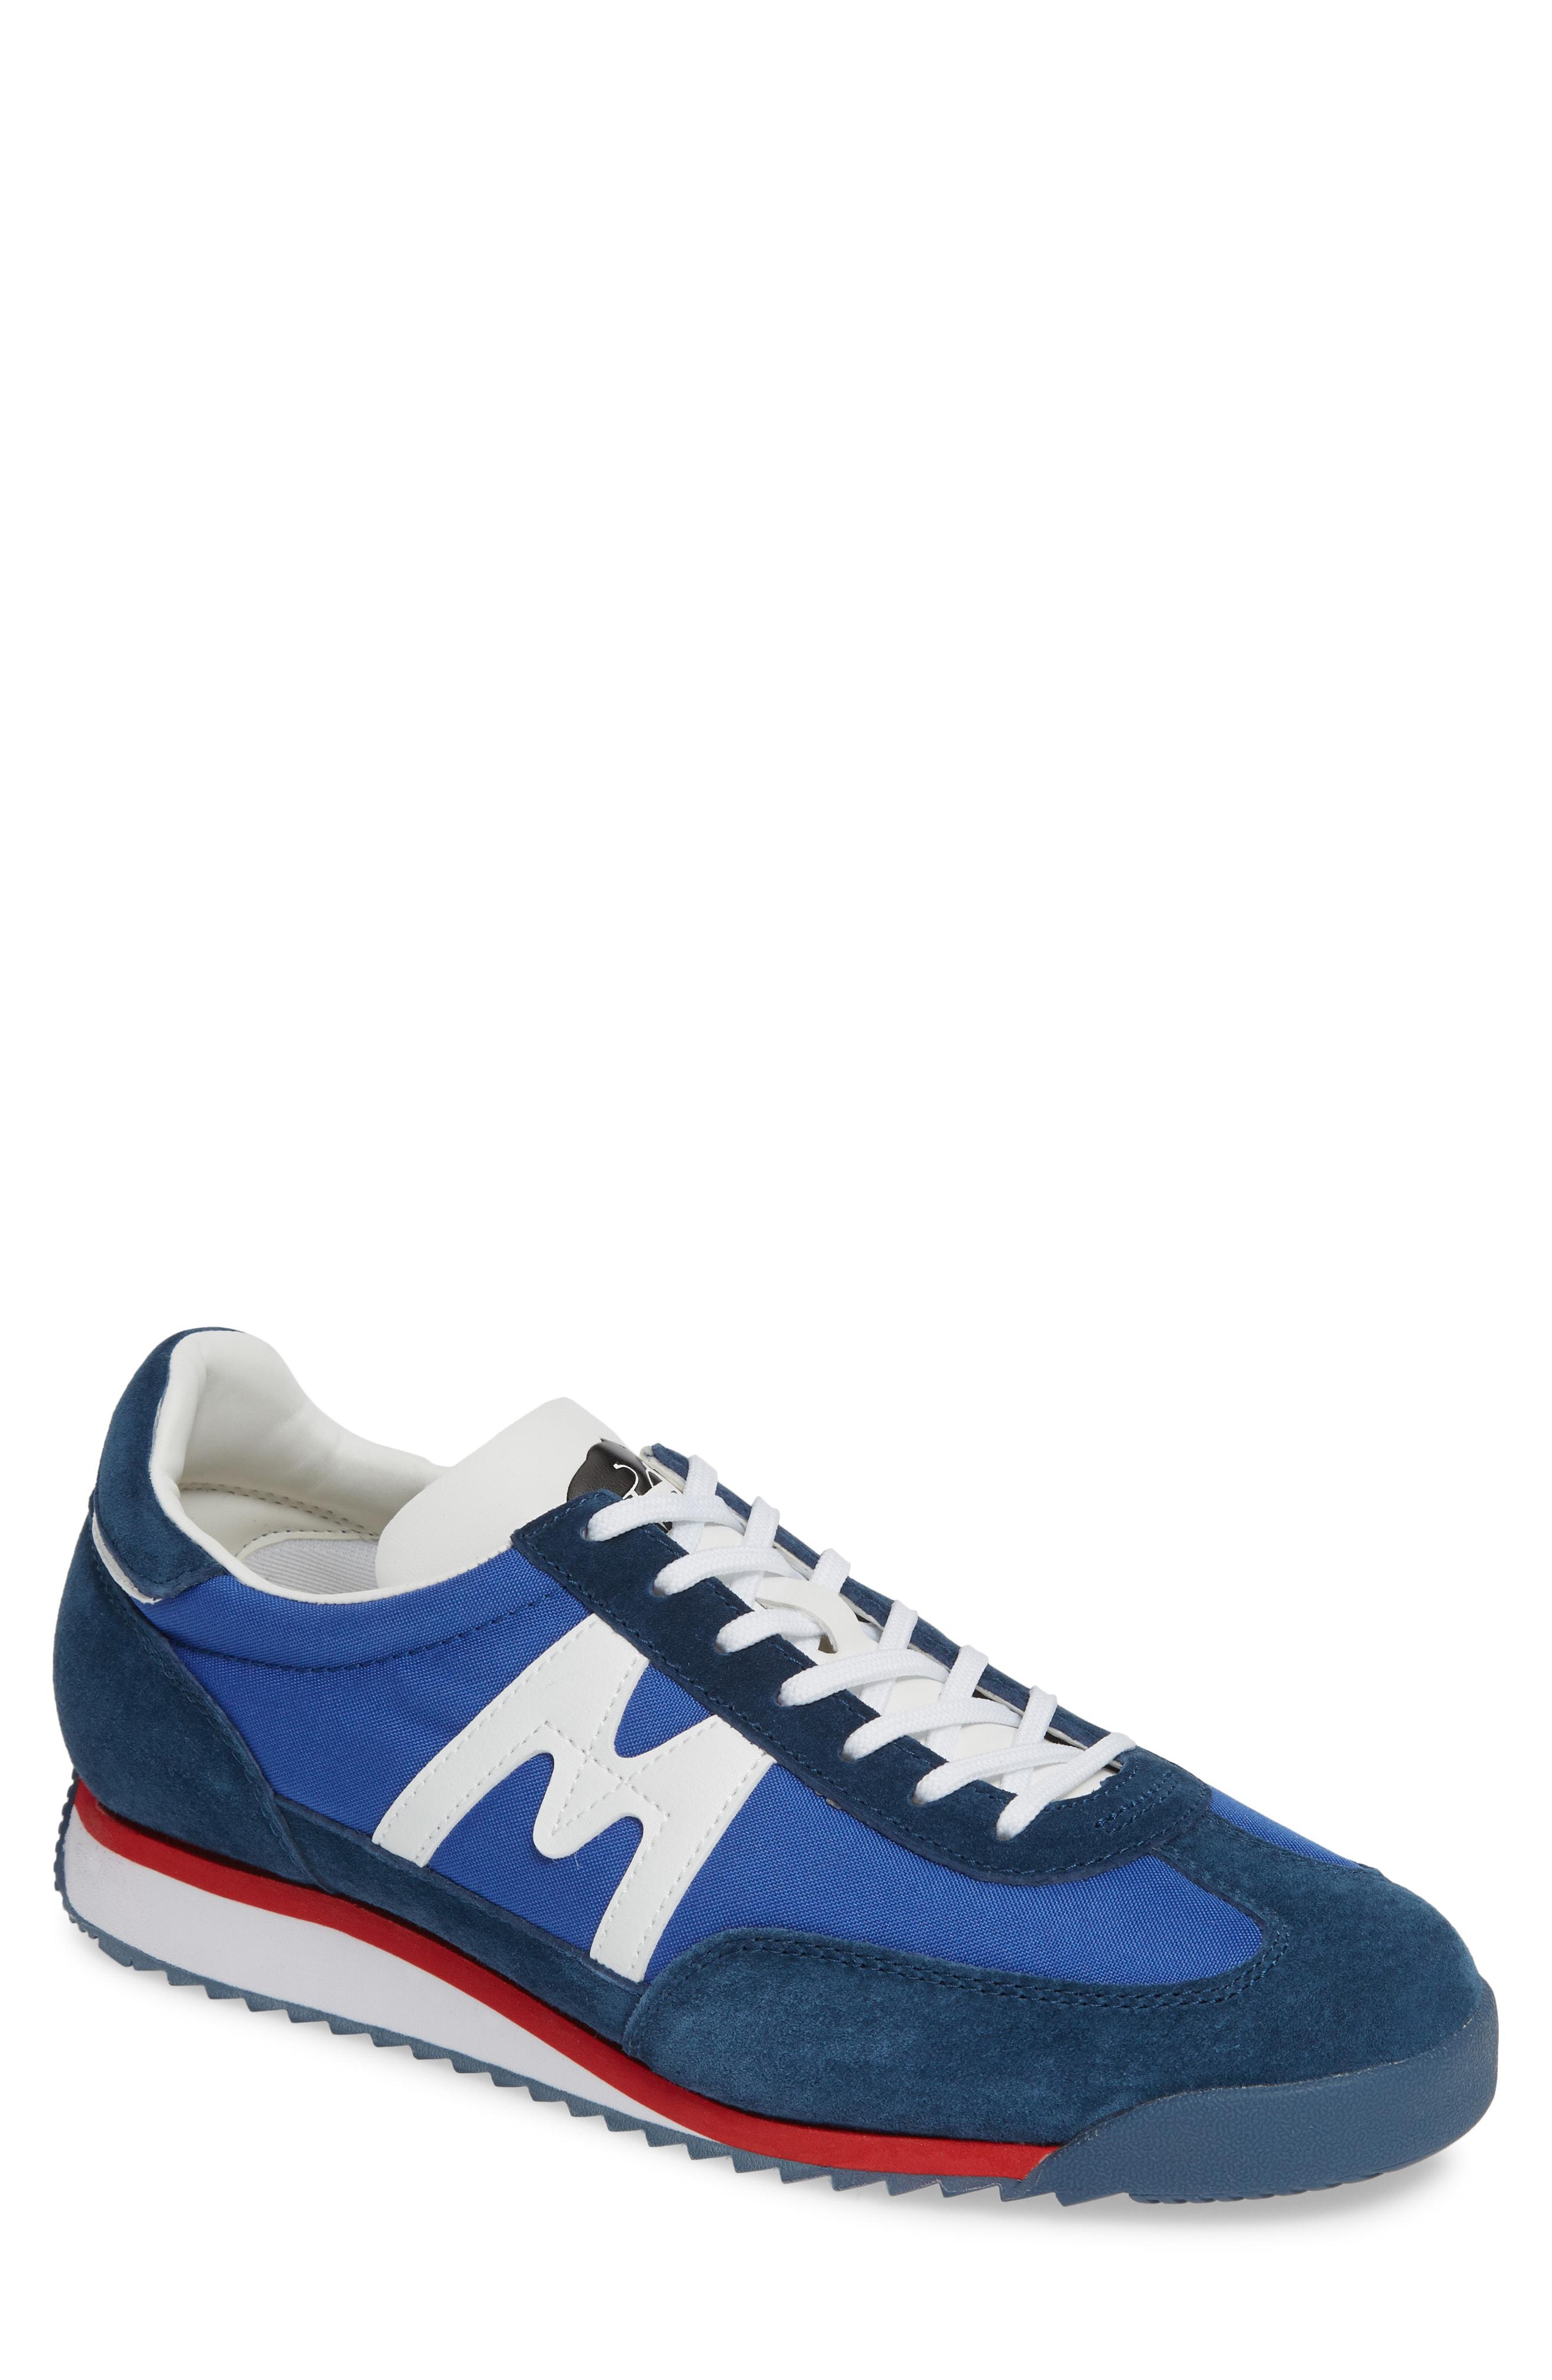 63667072fc2cb Karhu Championair Sneaker In Classic Blue   White